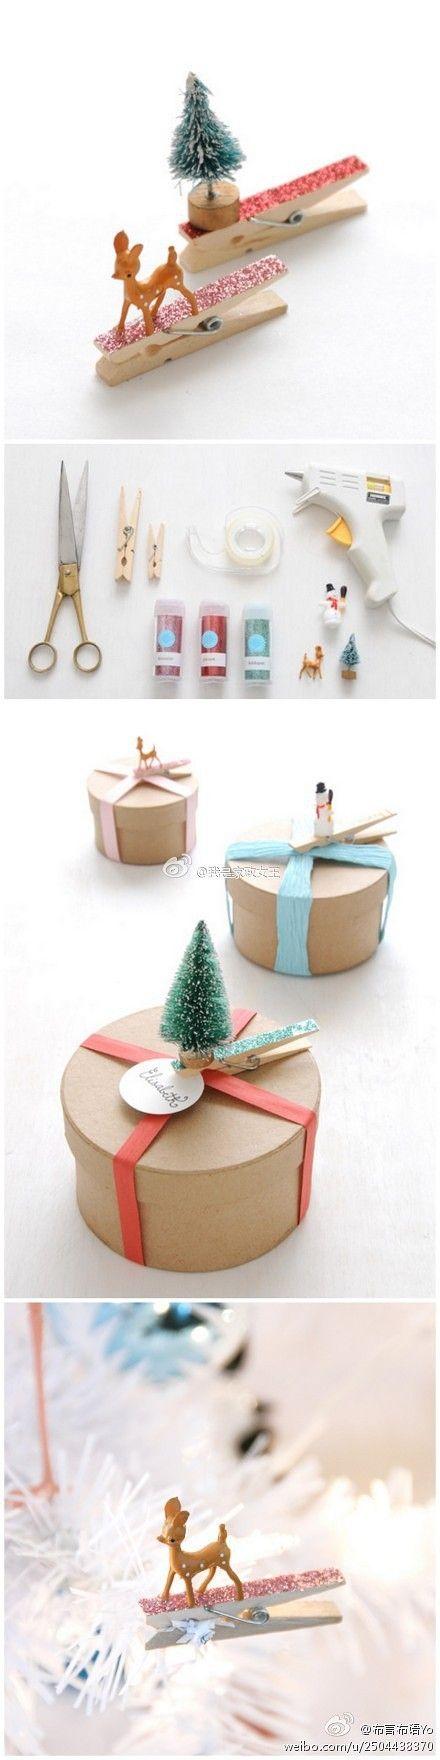 Christmas DIY: decorating clothespins to use for name tags on those Christmas…